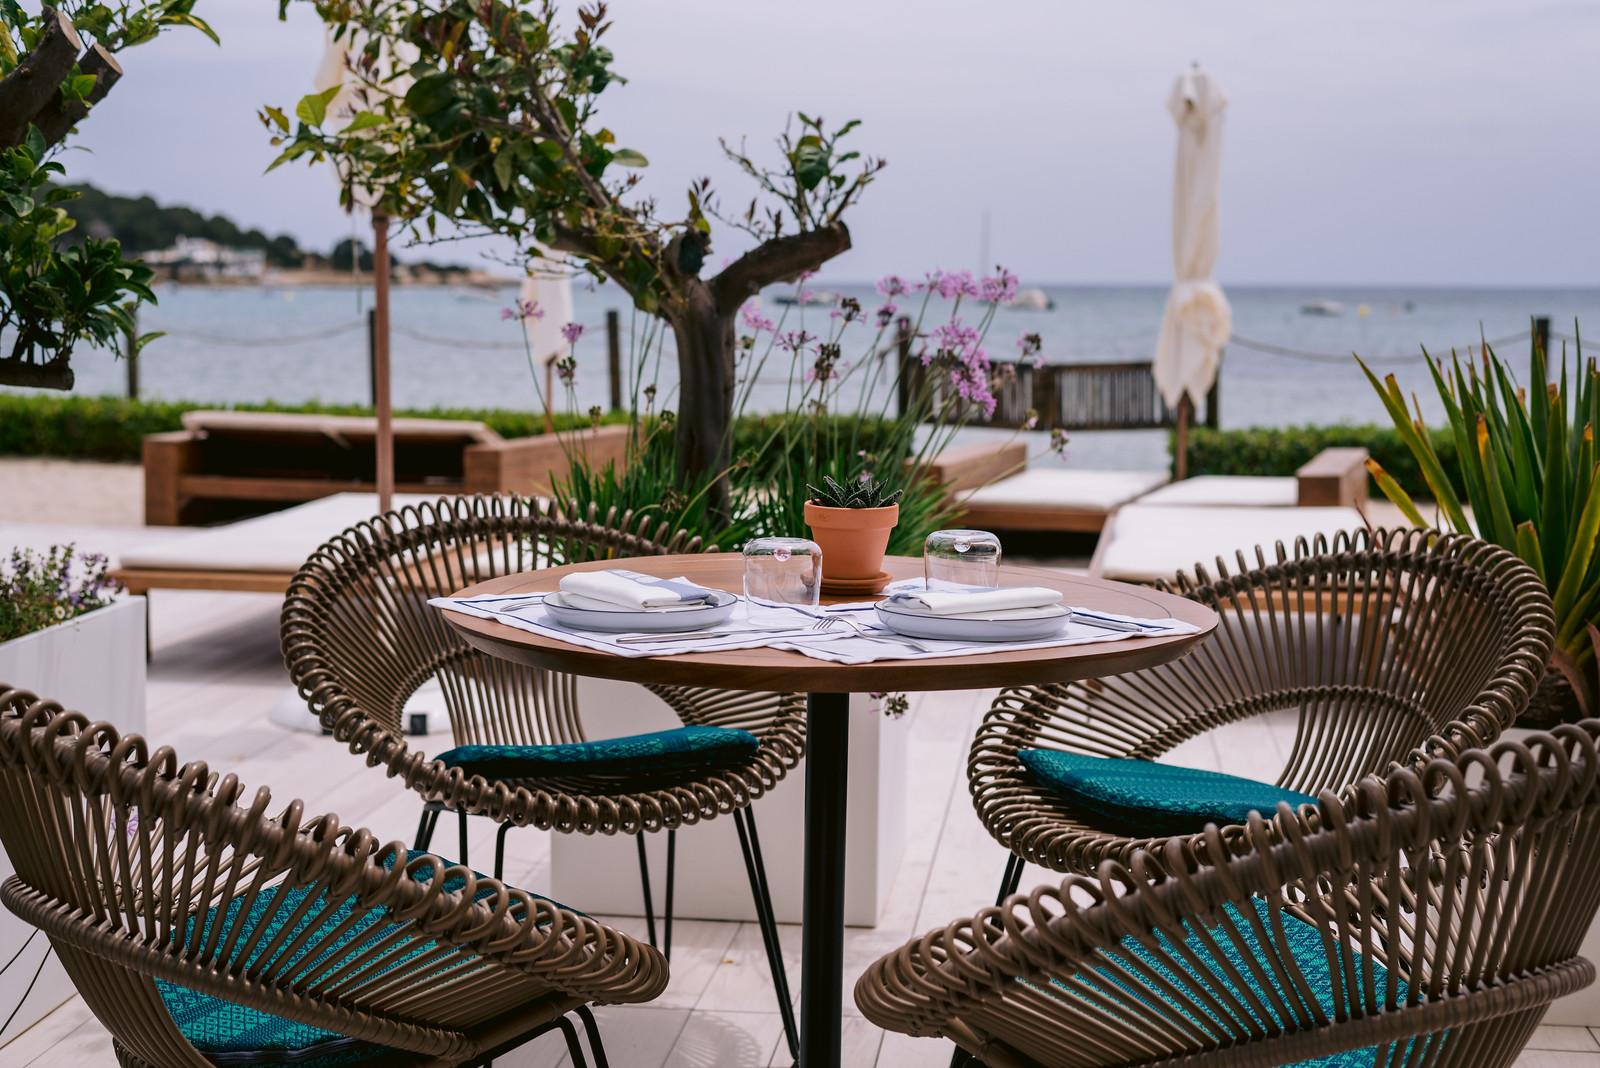 https://www.white-ibiza.com/wp-content/uploads/2021/06/white-ibiza-restaurants-bibo-ibiza-bay-01.jpg